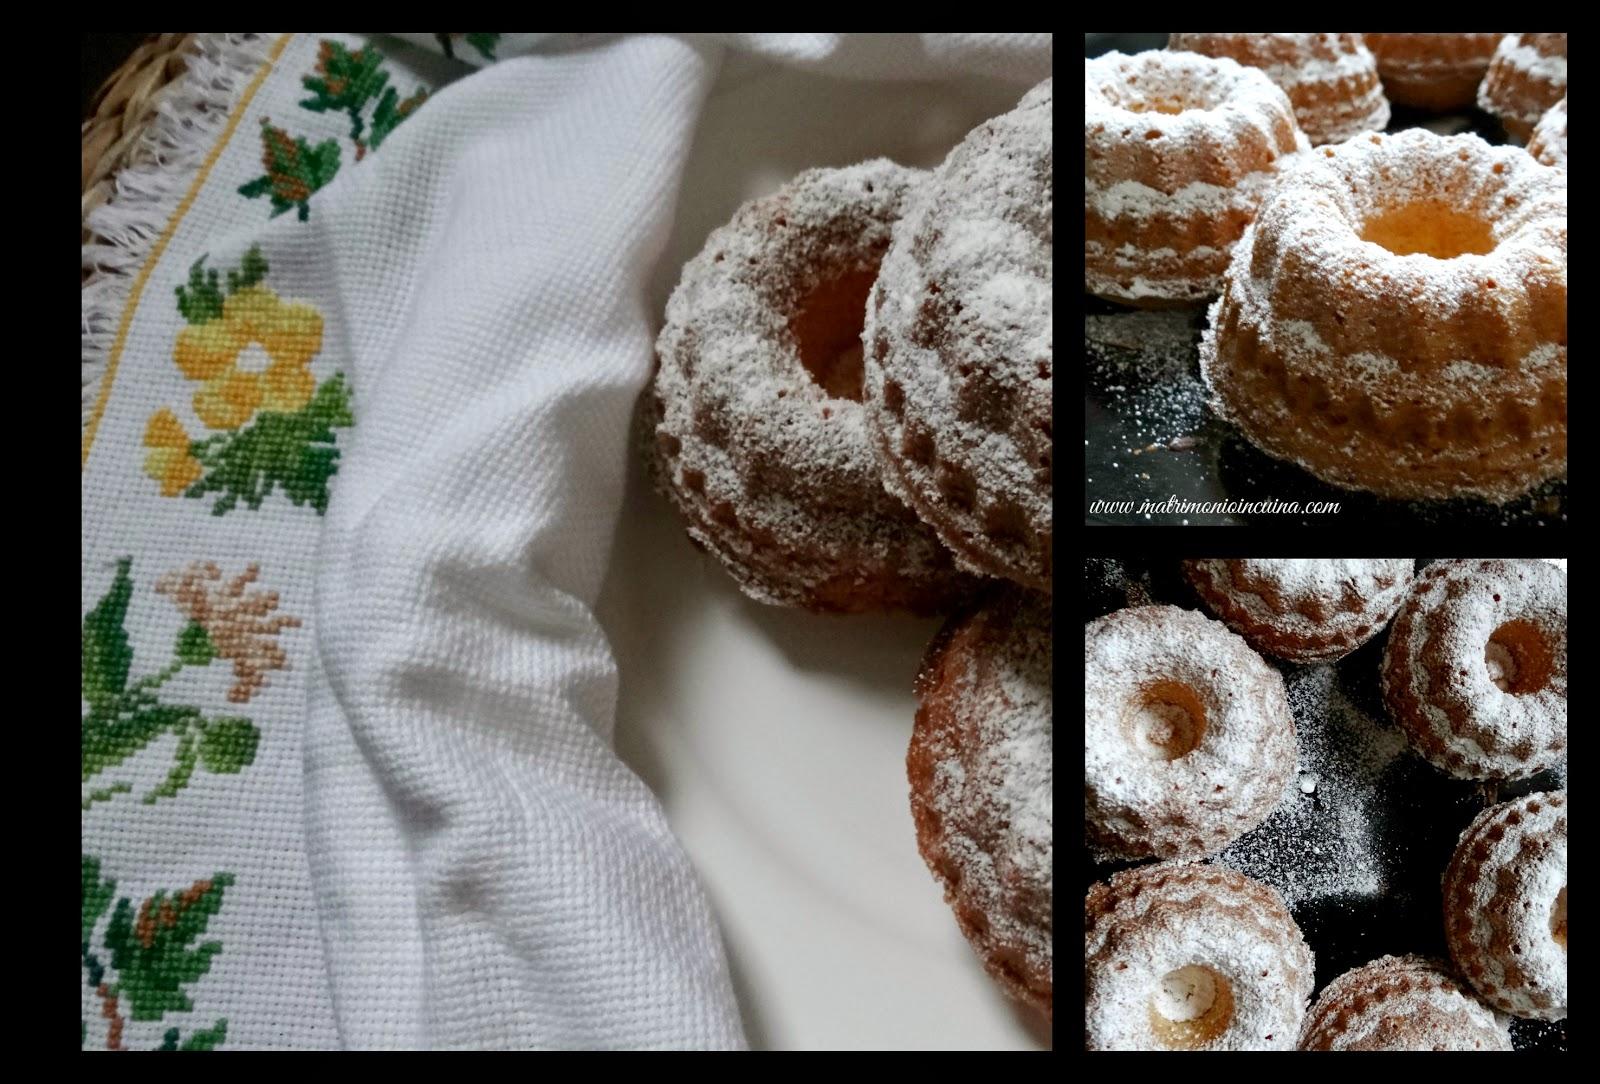 ciambelle, cake, frumina, blog, foodblog